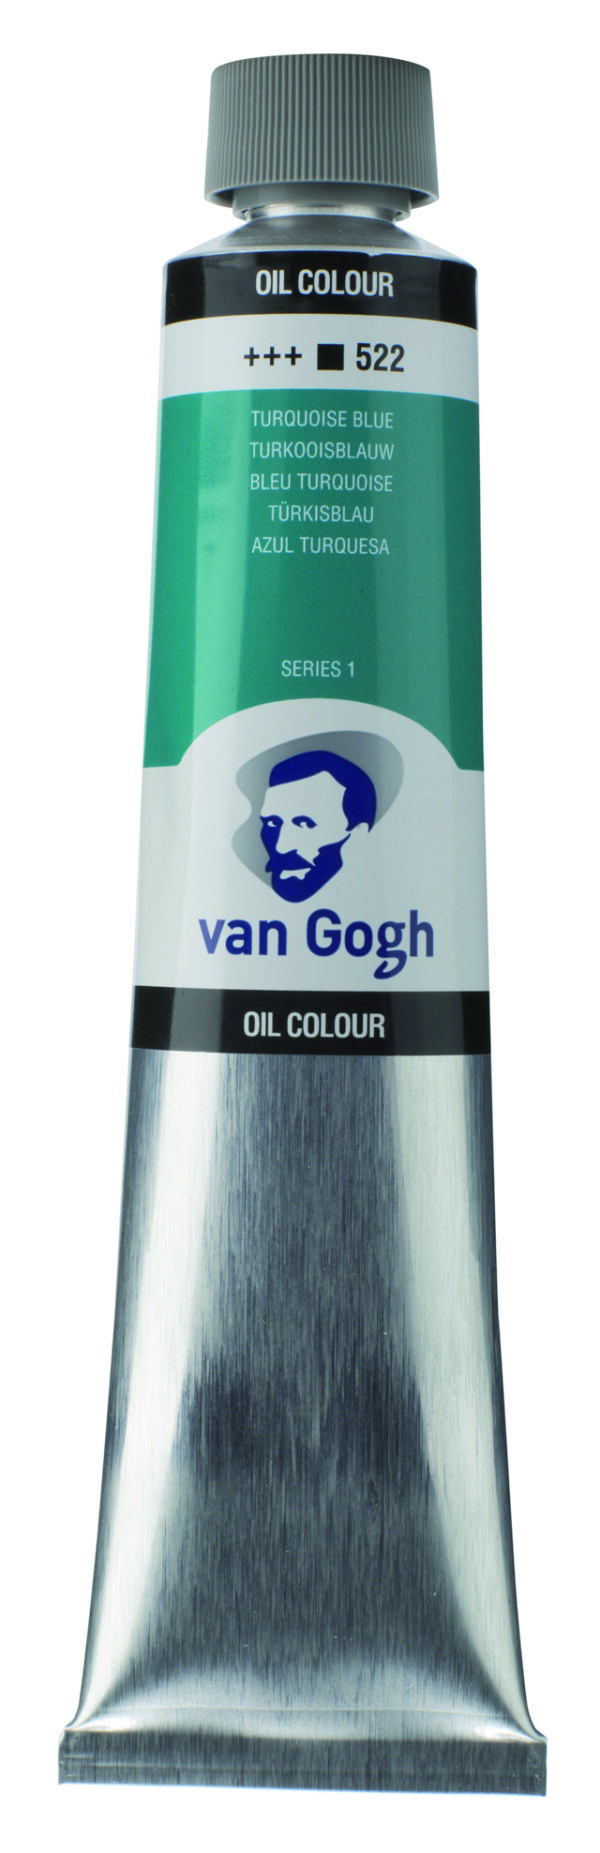 Van Gogh 522 Turquoise blue - 200 ml